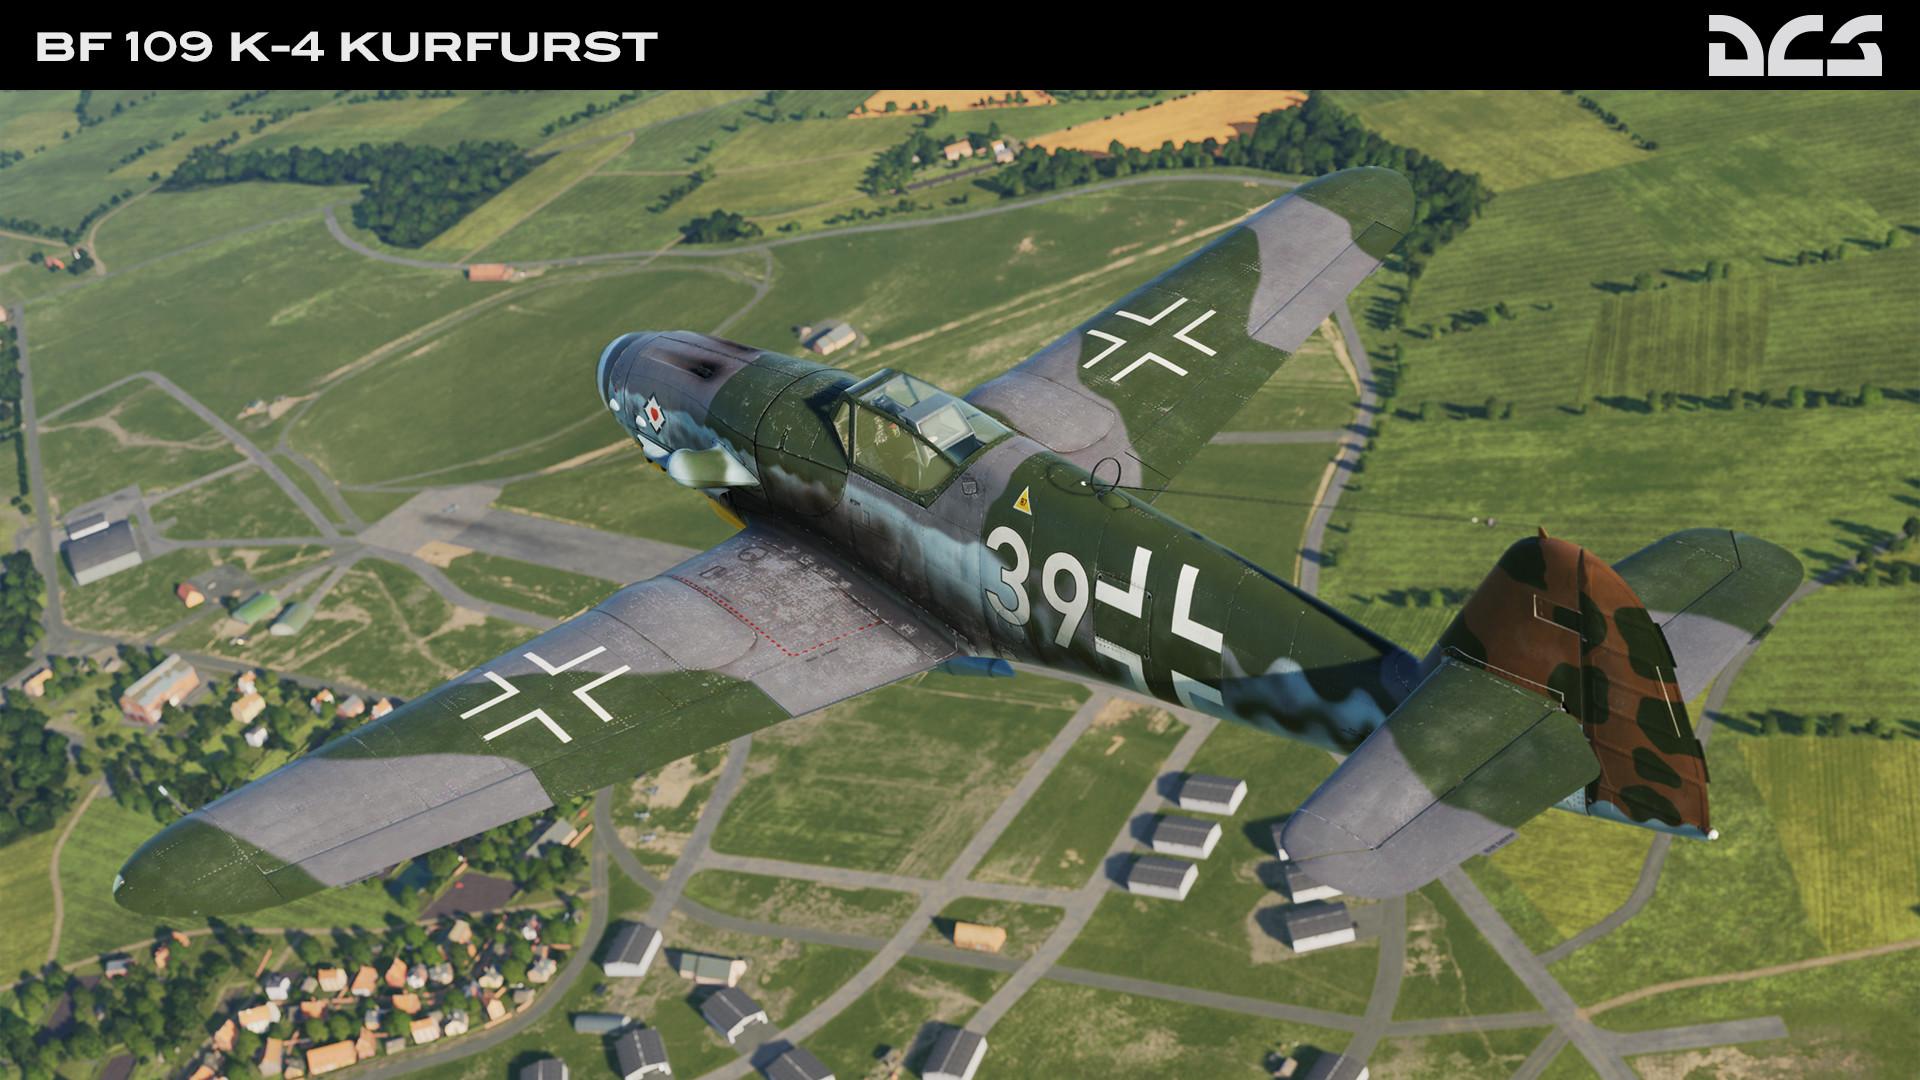 DCS: Bf 109 K-4 Kurfürst screenshot